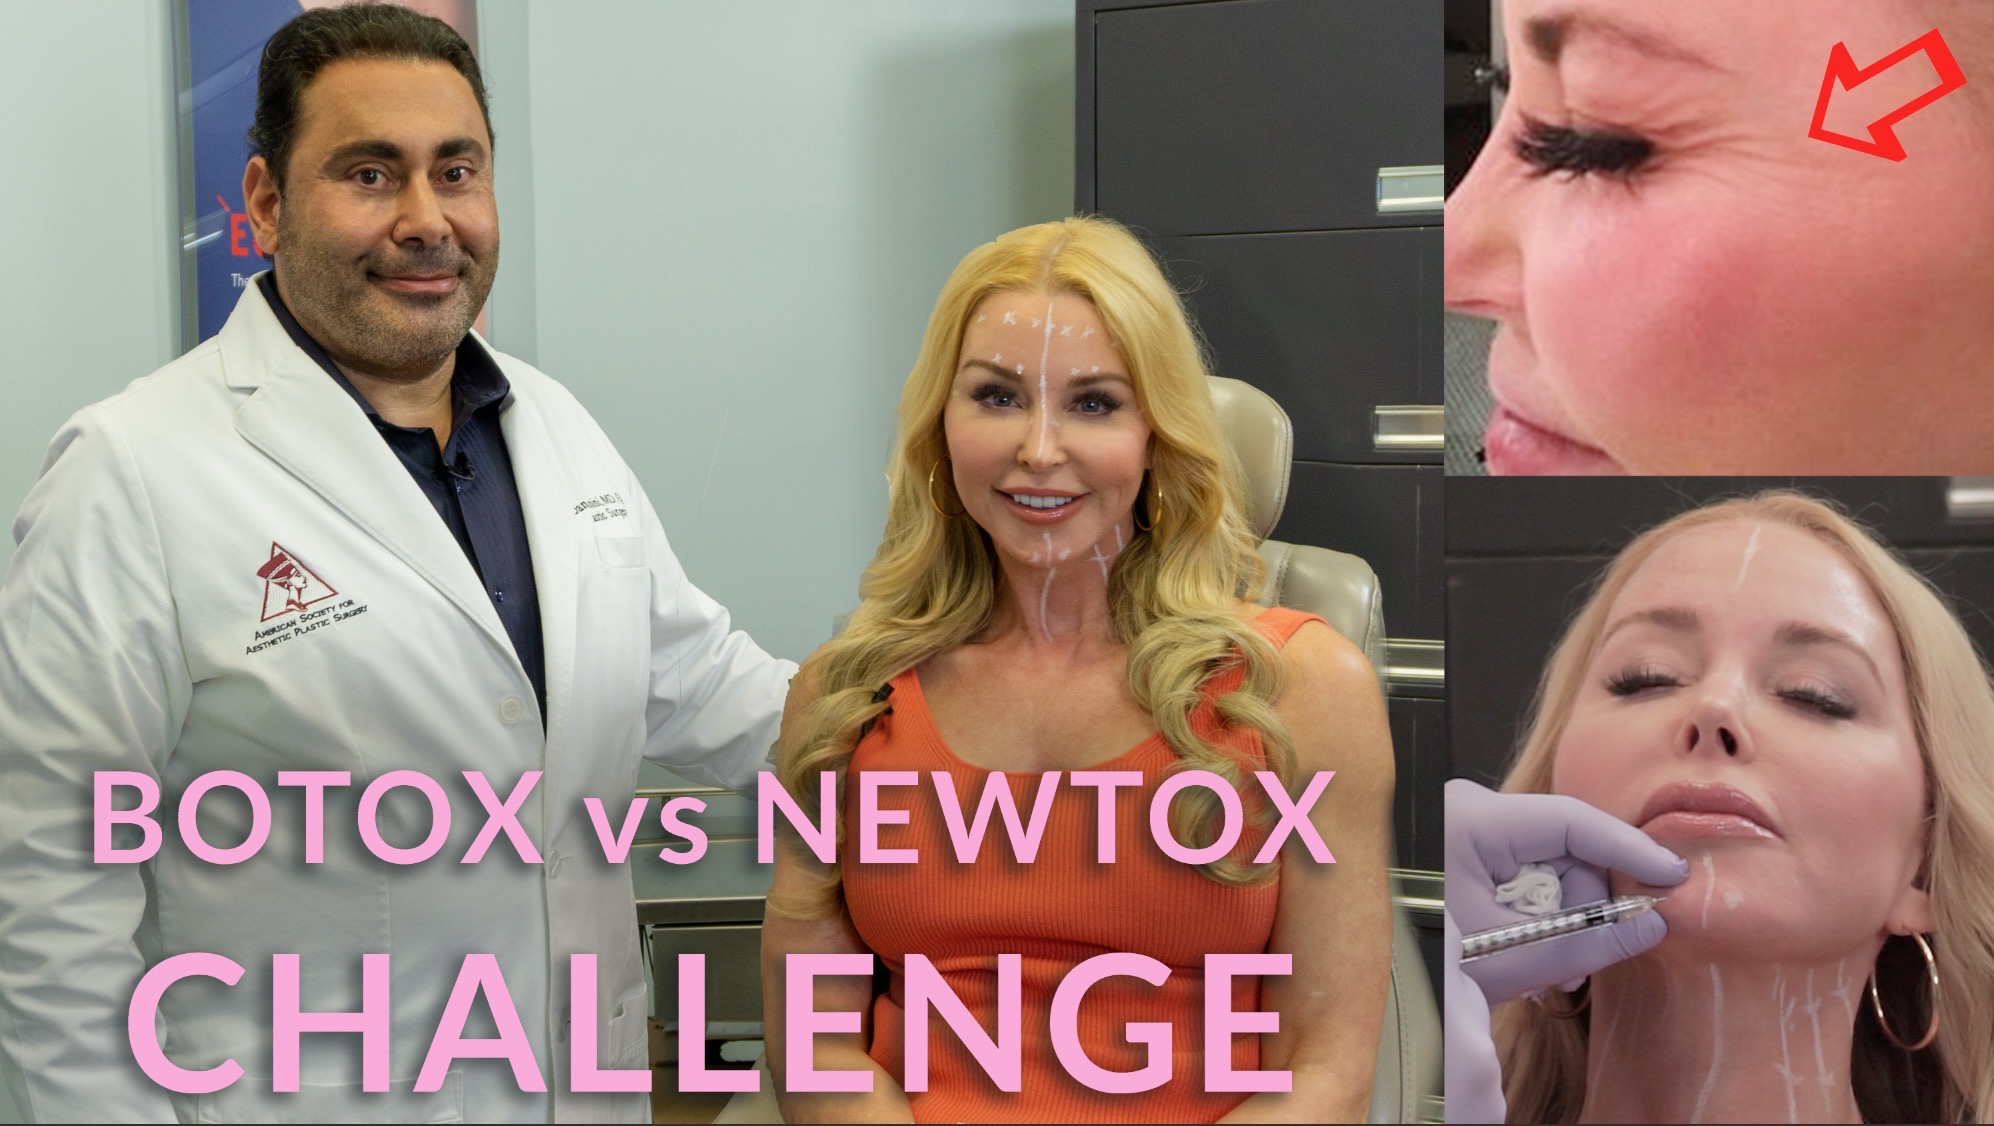 botox vs newtox